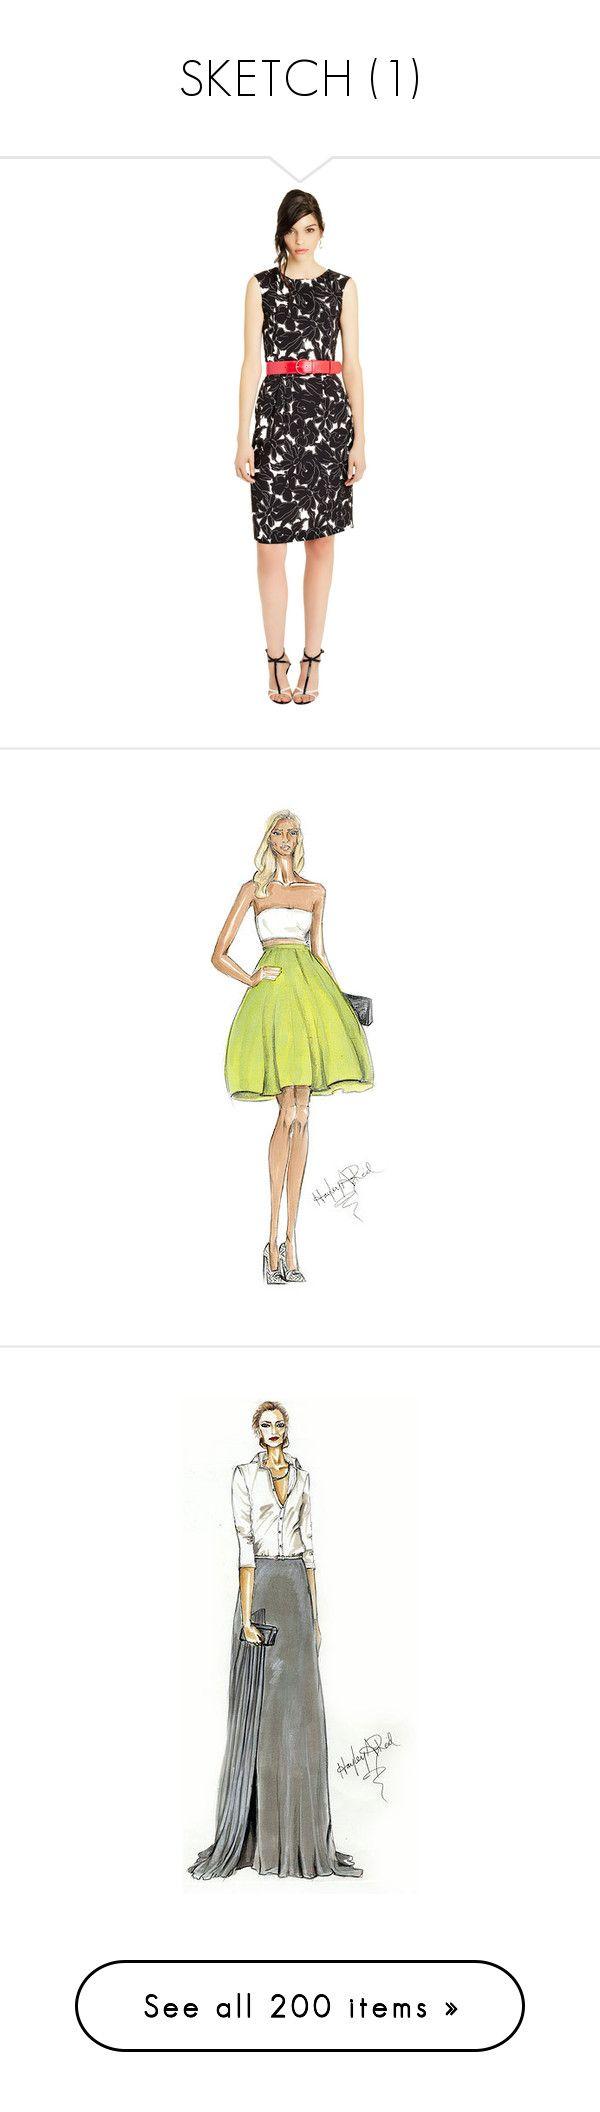 """SKETCH (1)"" by twarnav ❤ liked on Polyvore featuring dresses, holiday shift dresses, embellished dress, stretchy dresses, print shift dress, oscar de la renta dresses, sketches, backgrounds, models and people"